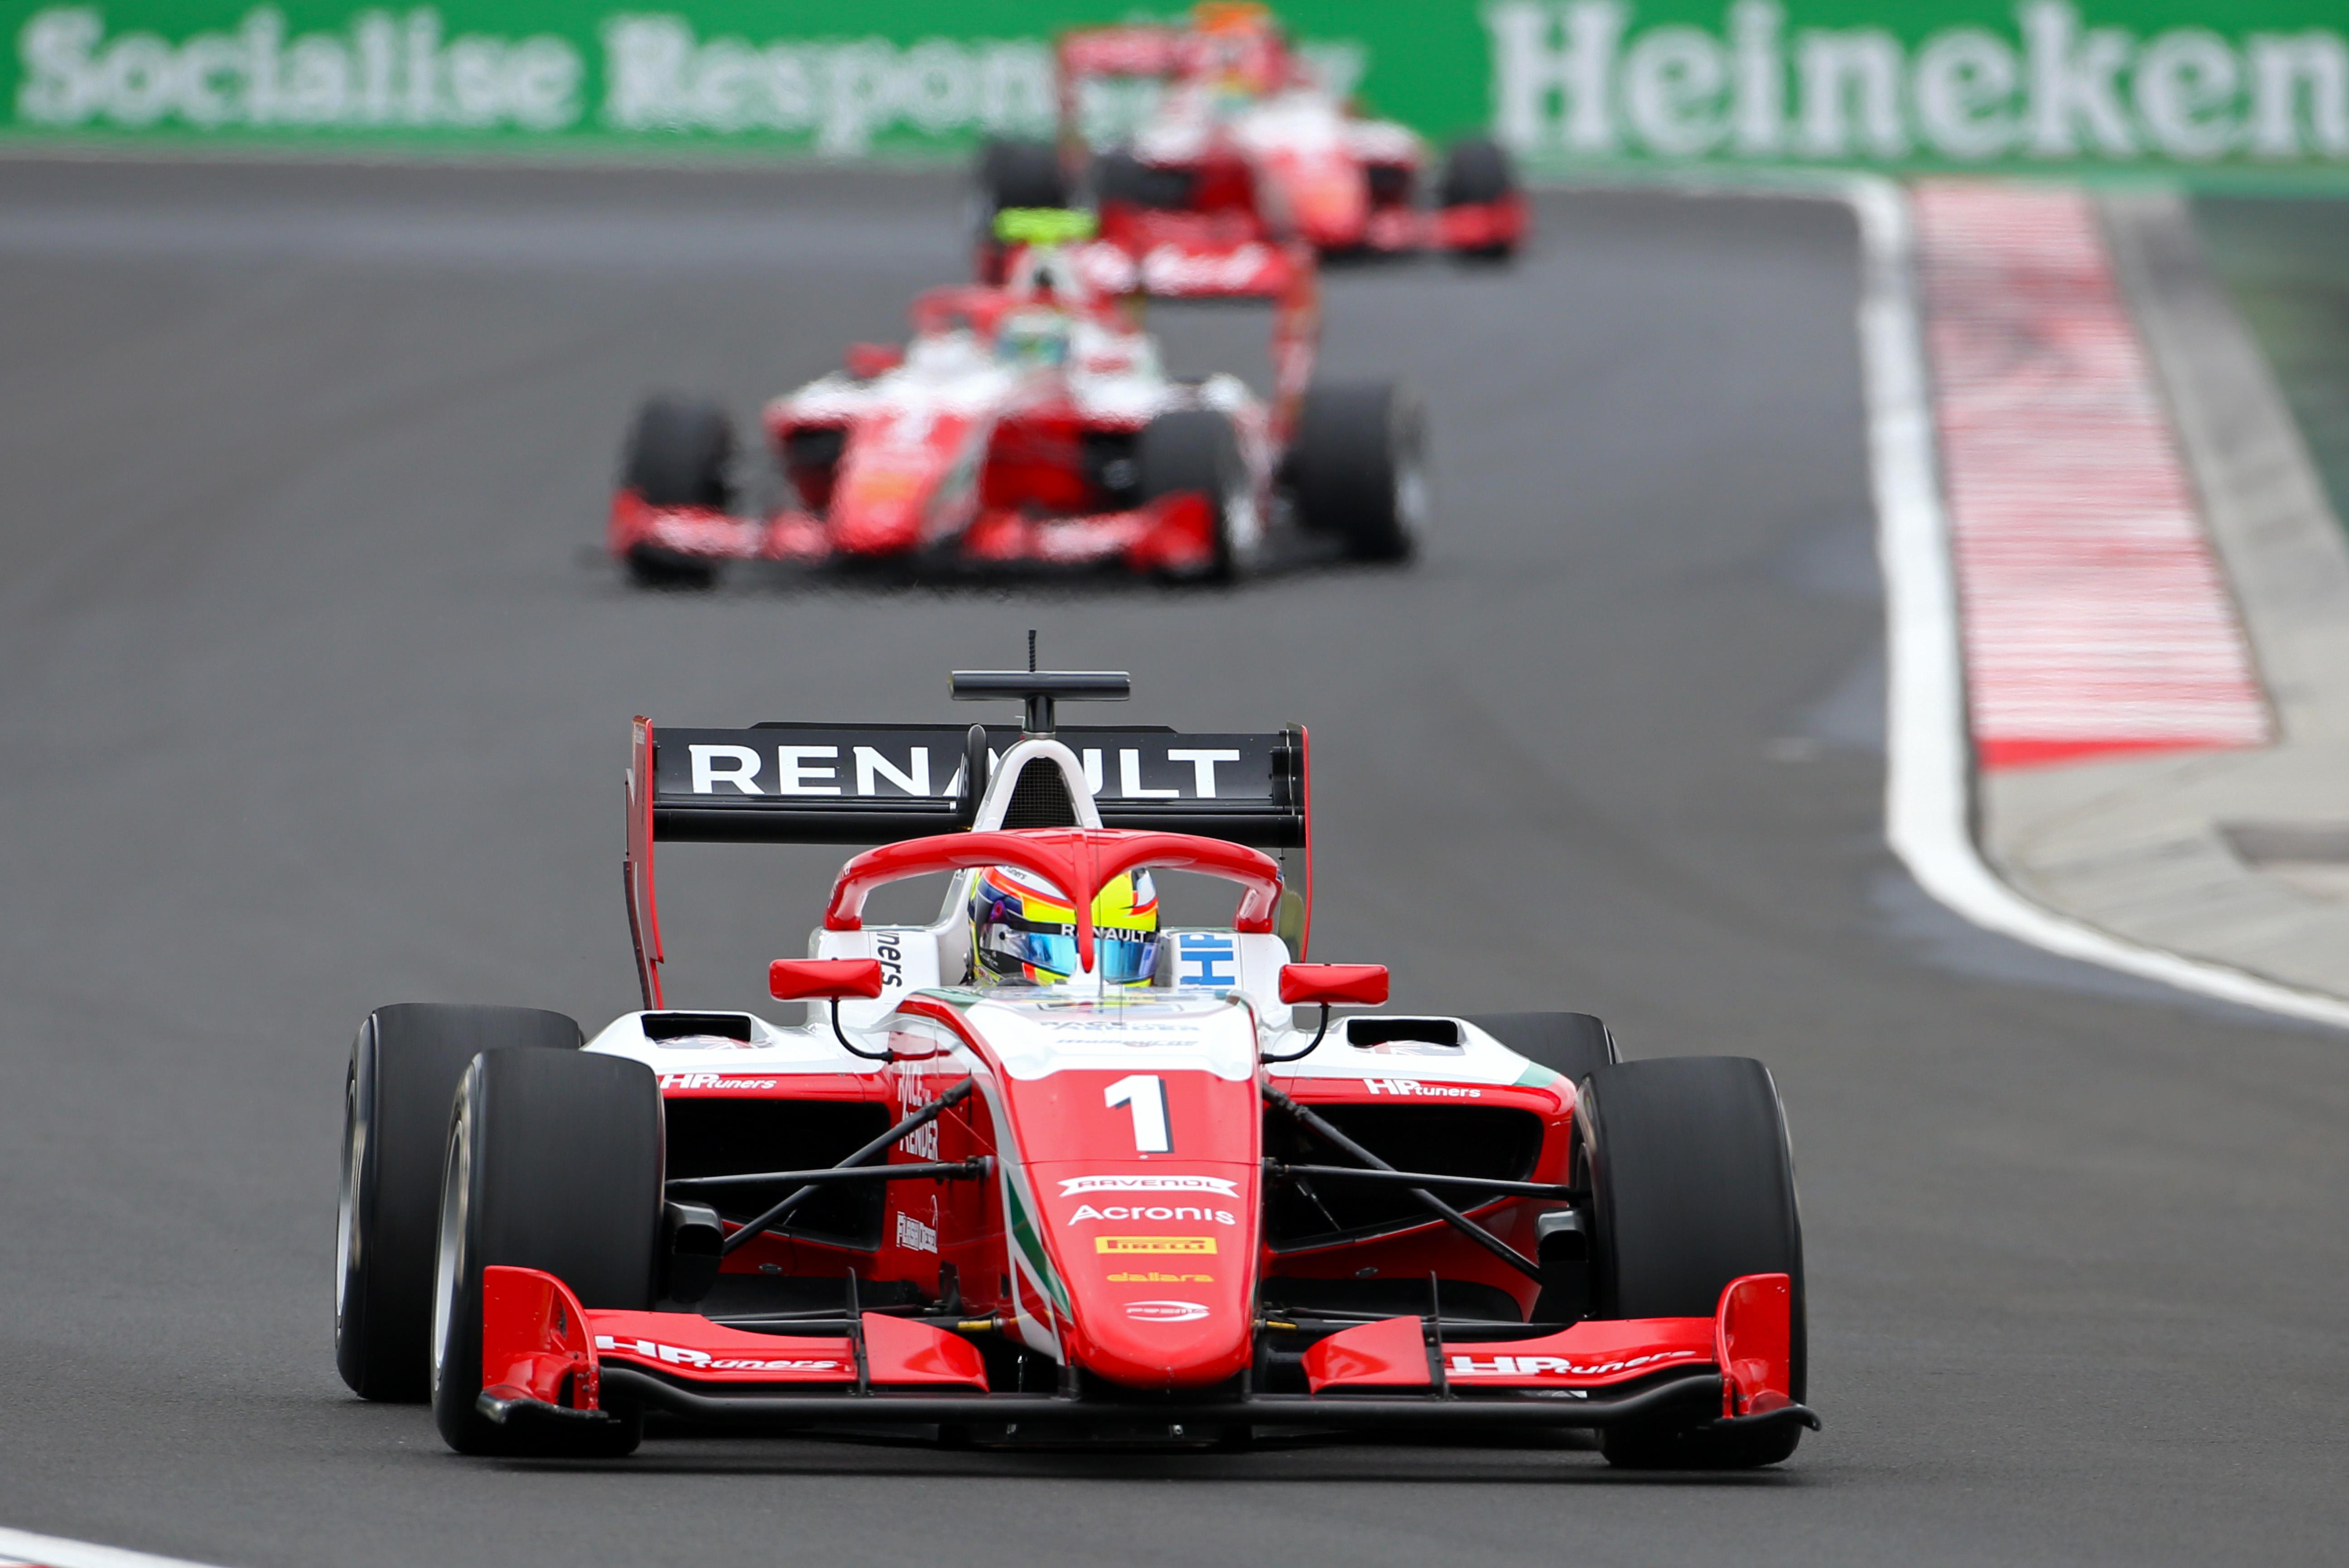 Motor Racing Fia Formula 3 Championship Friday Budapest, Hungary